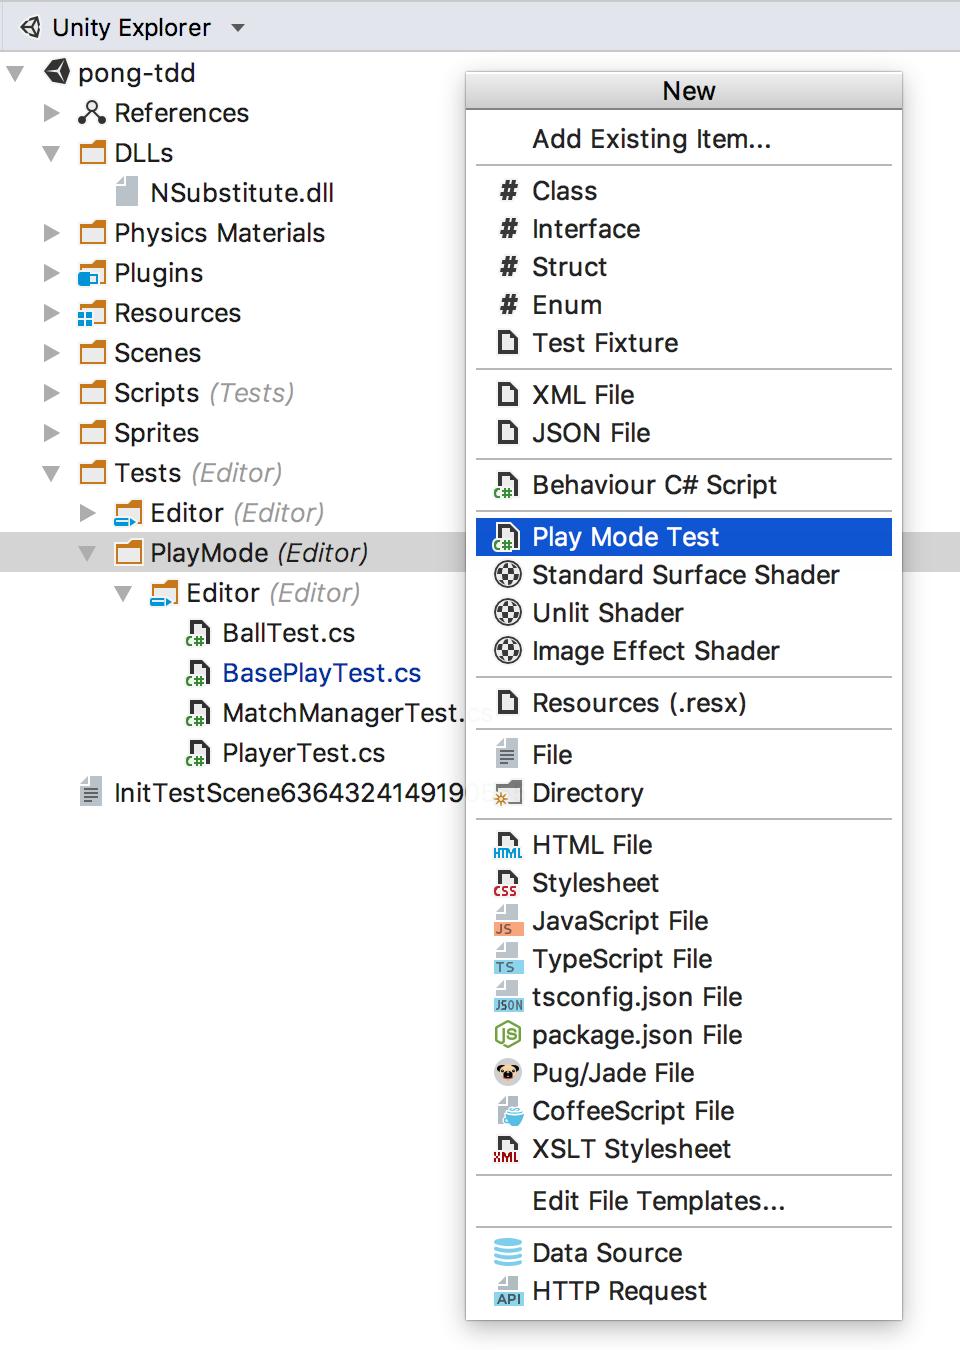 File templates menu